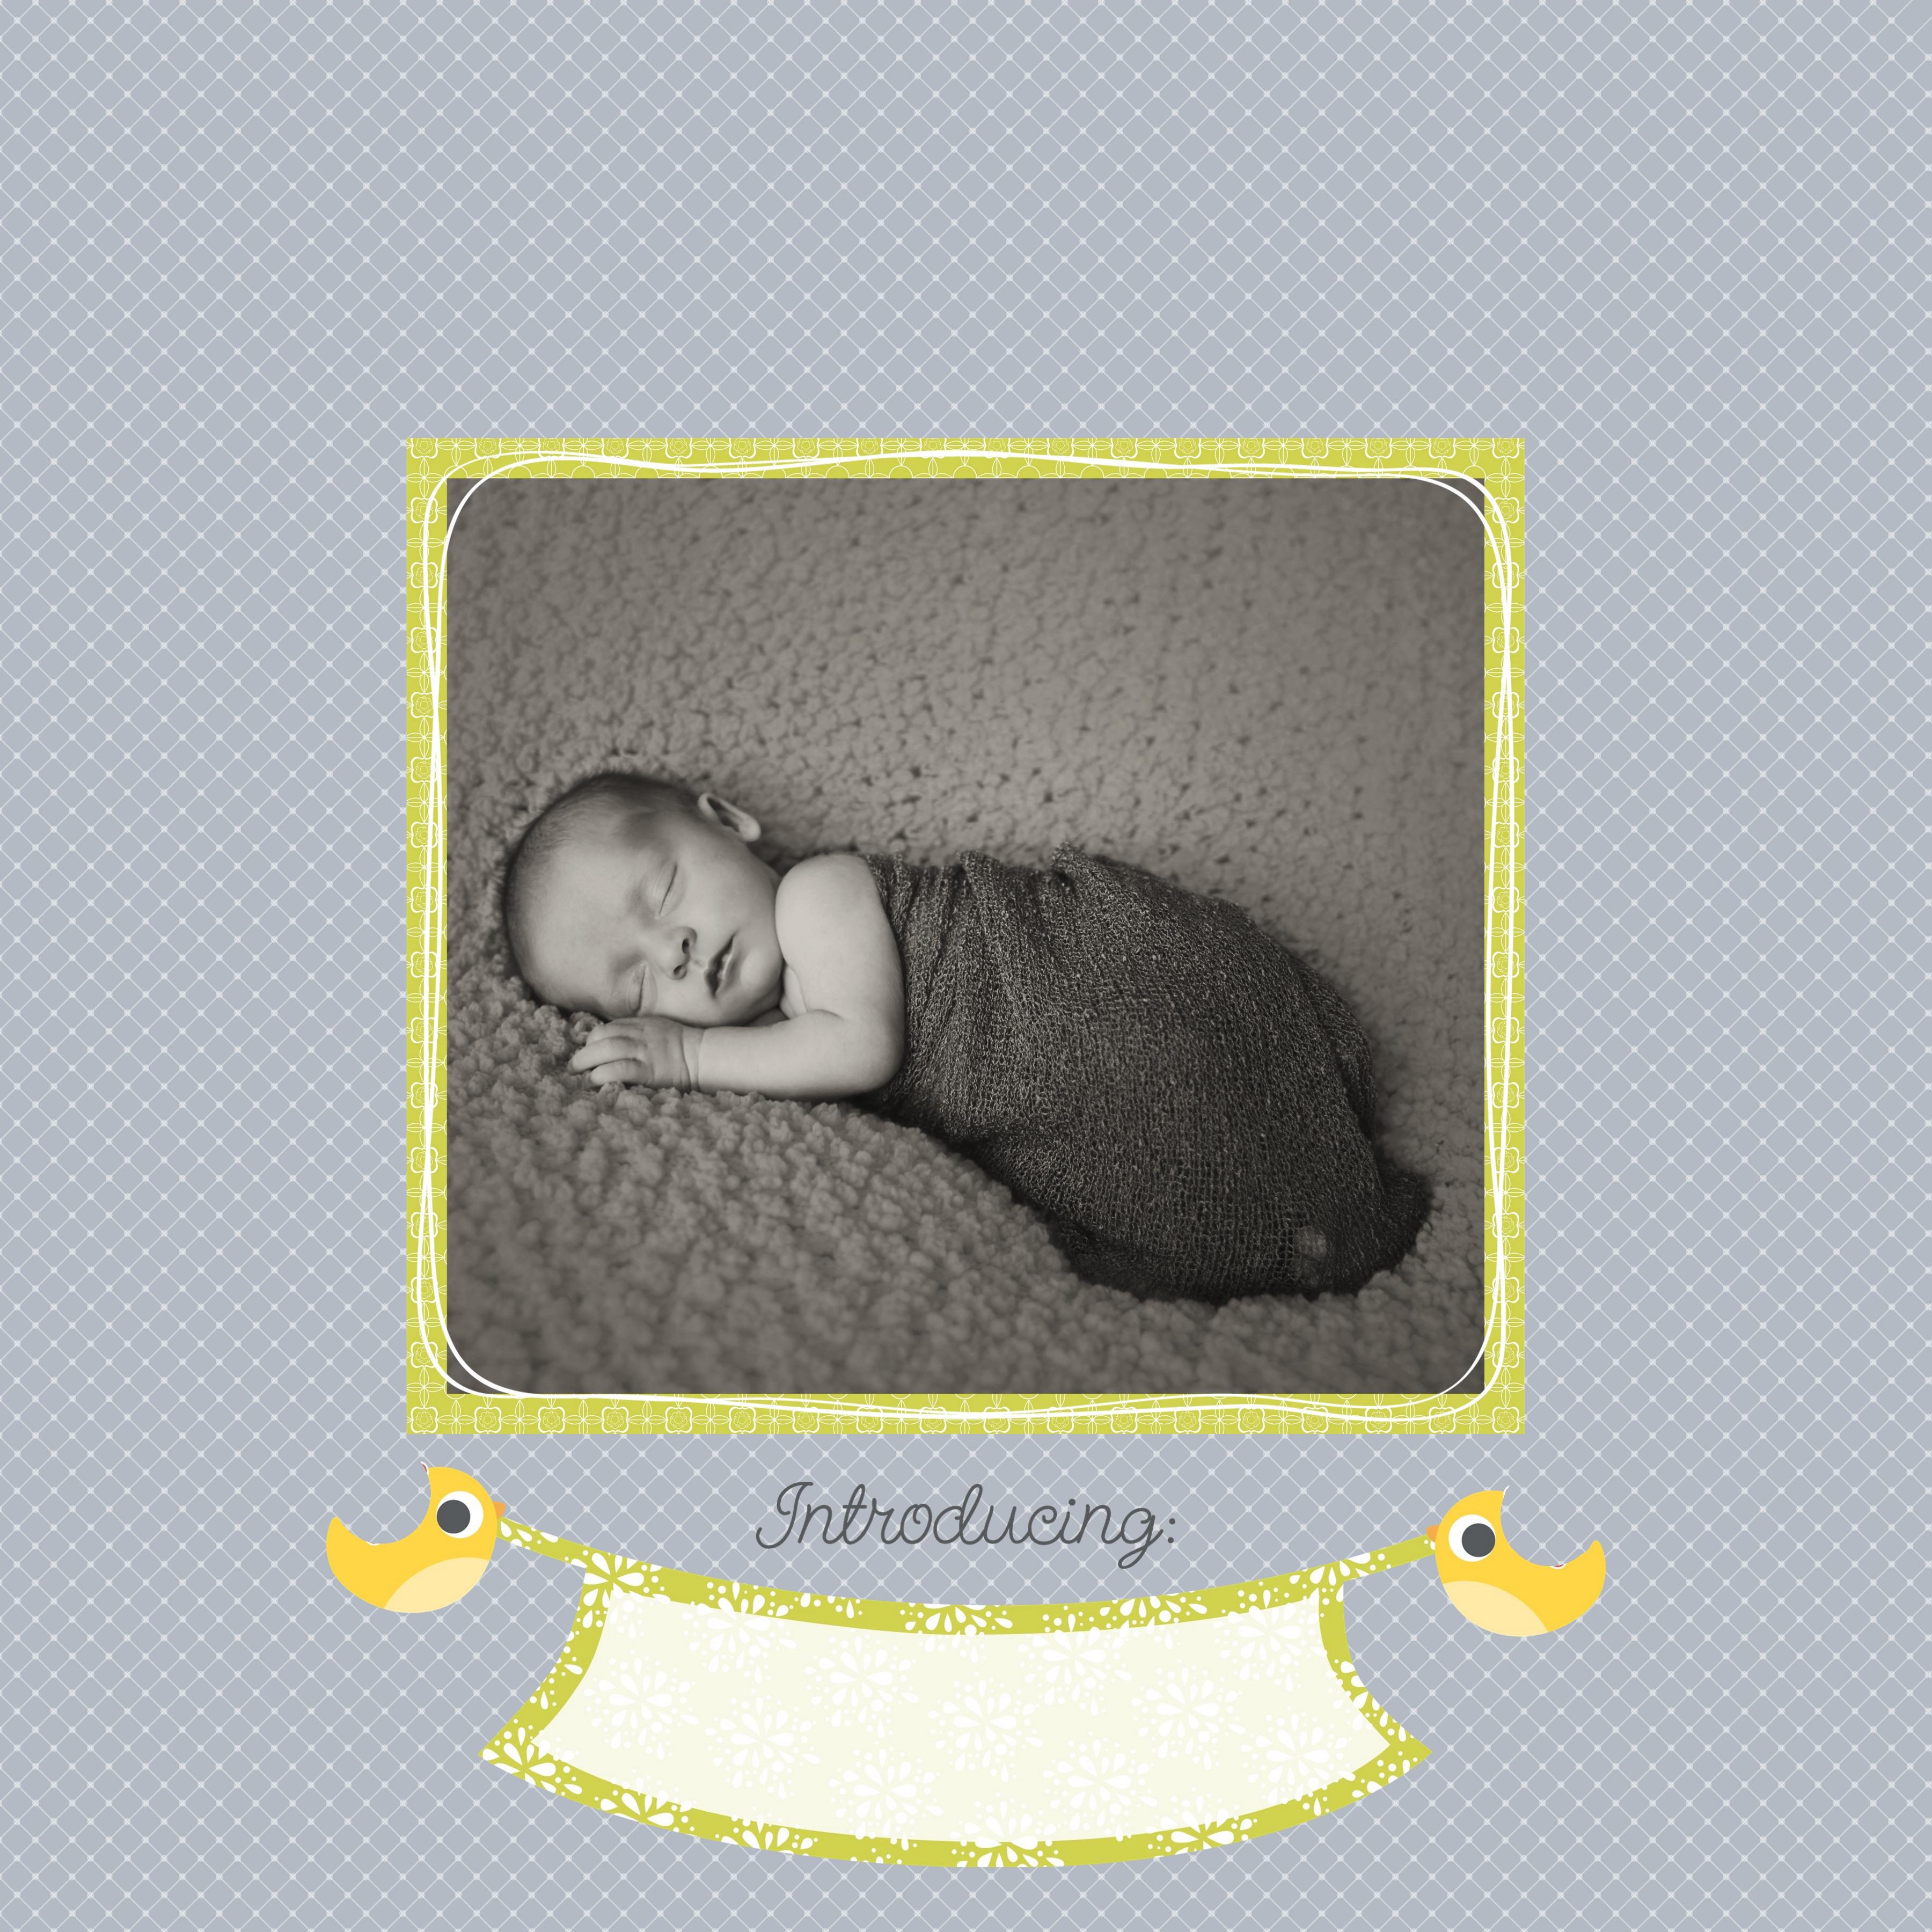 BabyBoy - Page 001.jpg